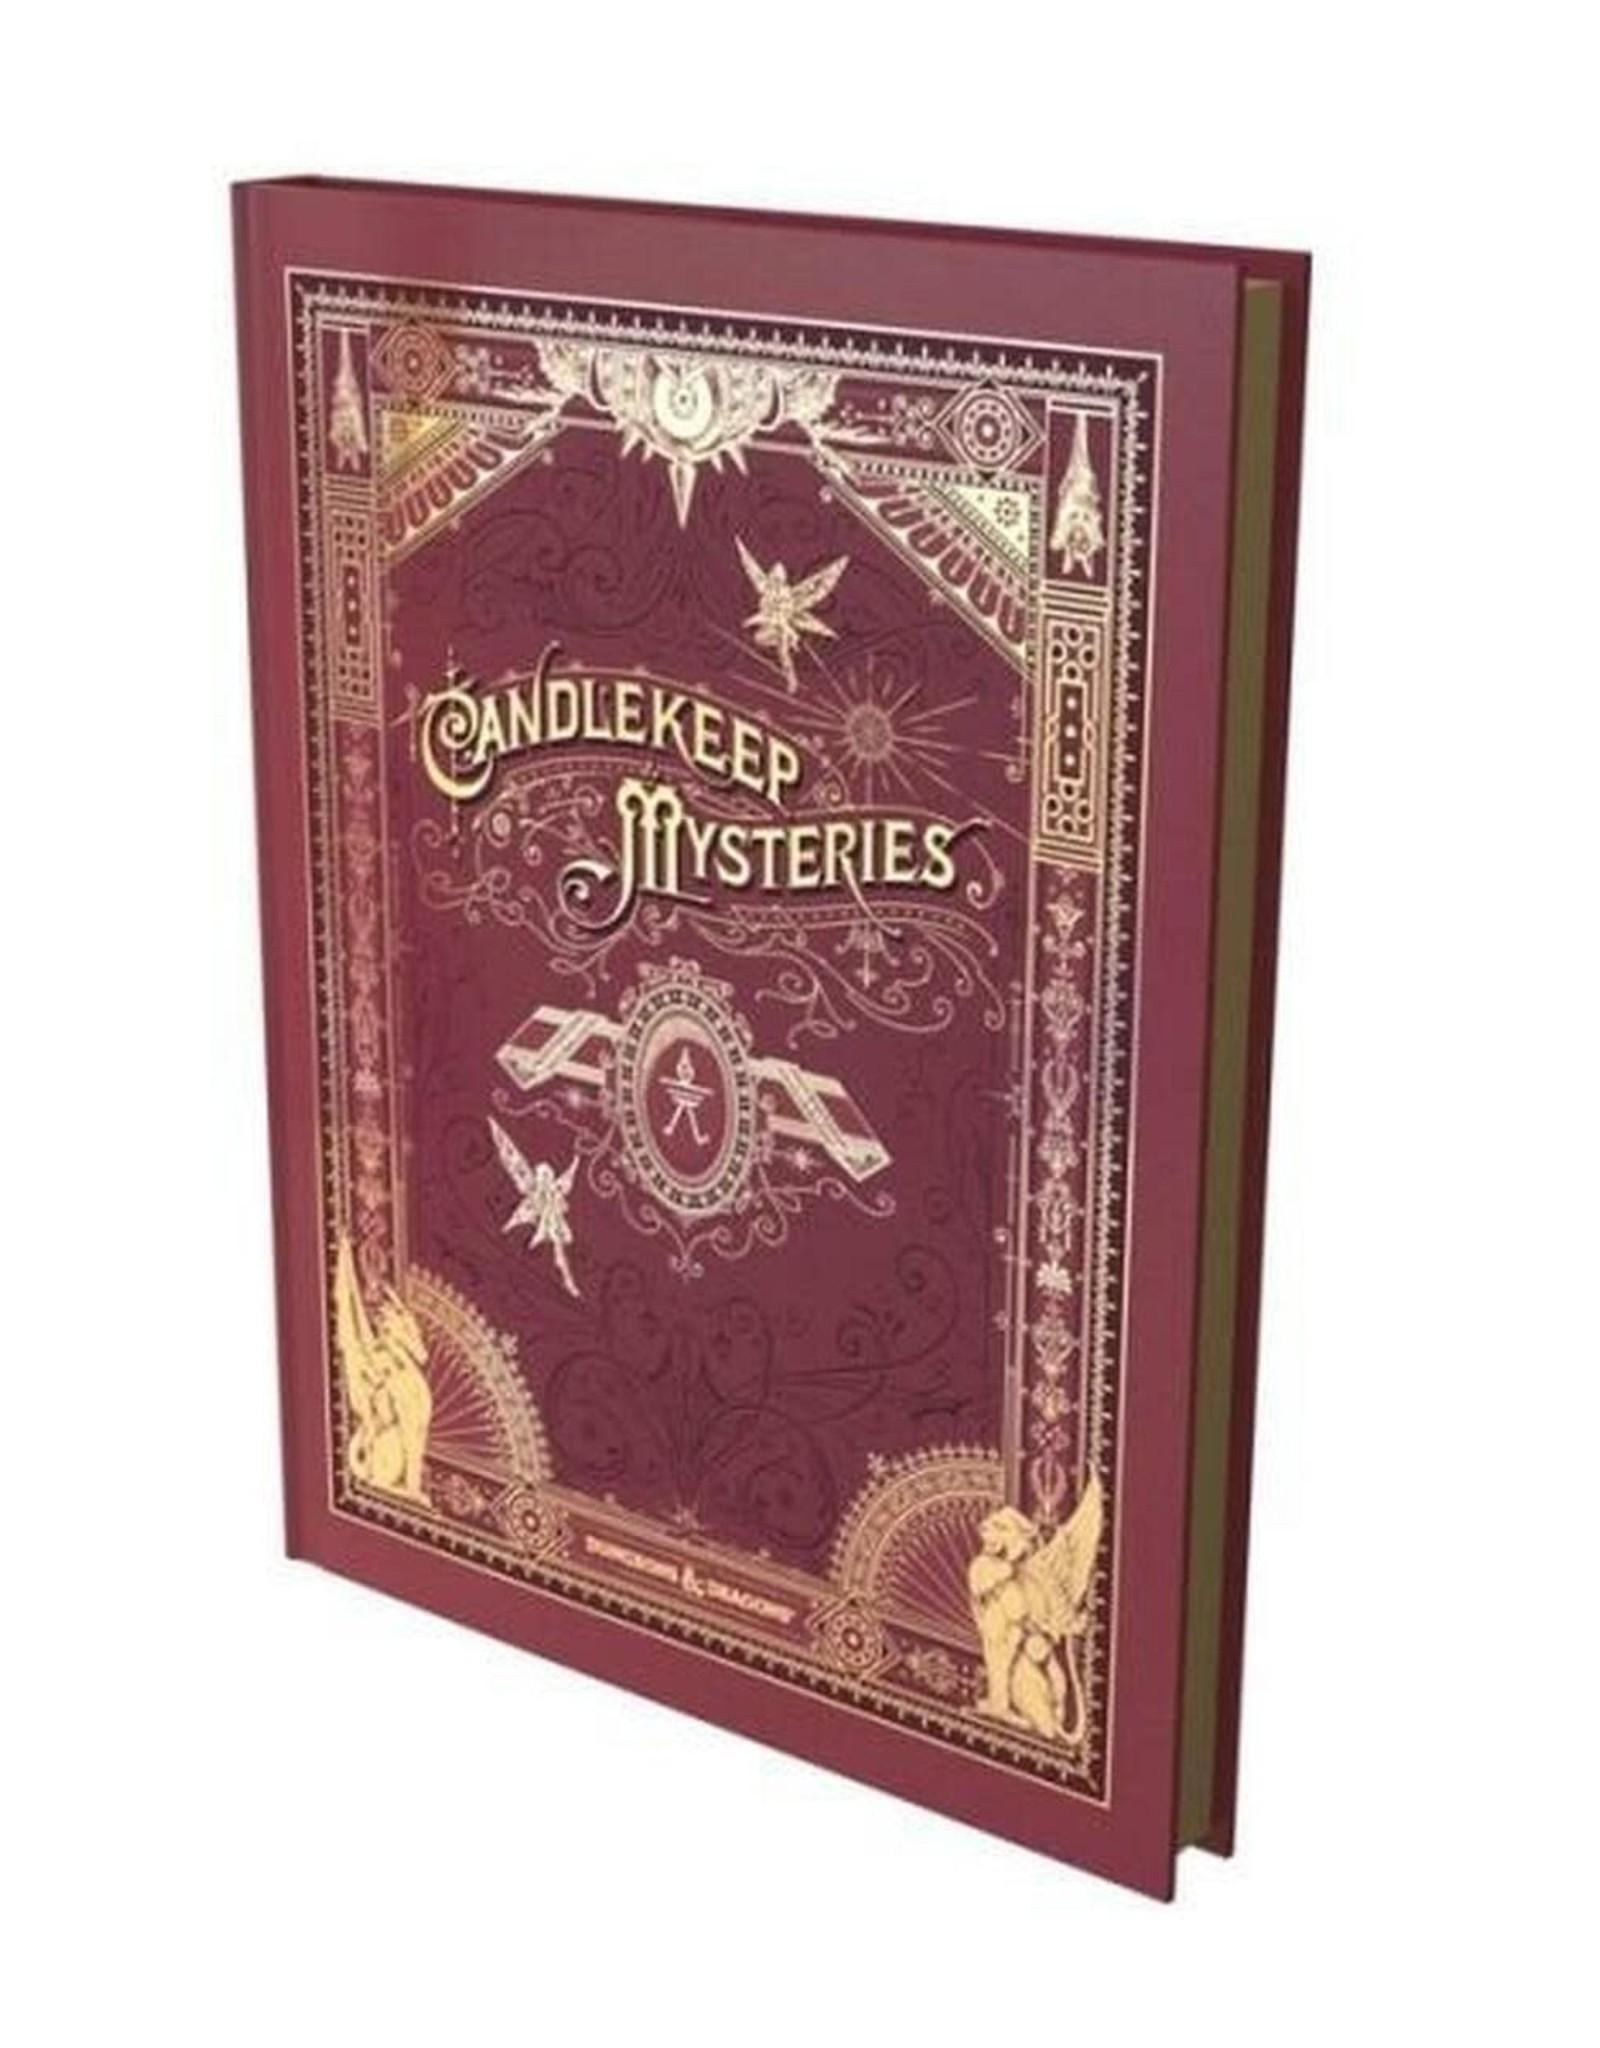 DND RPG Candlekeep Mysteries HC Alt Cover